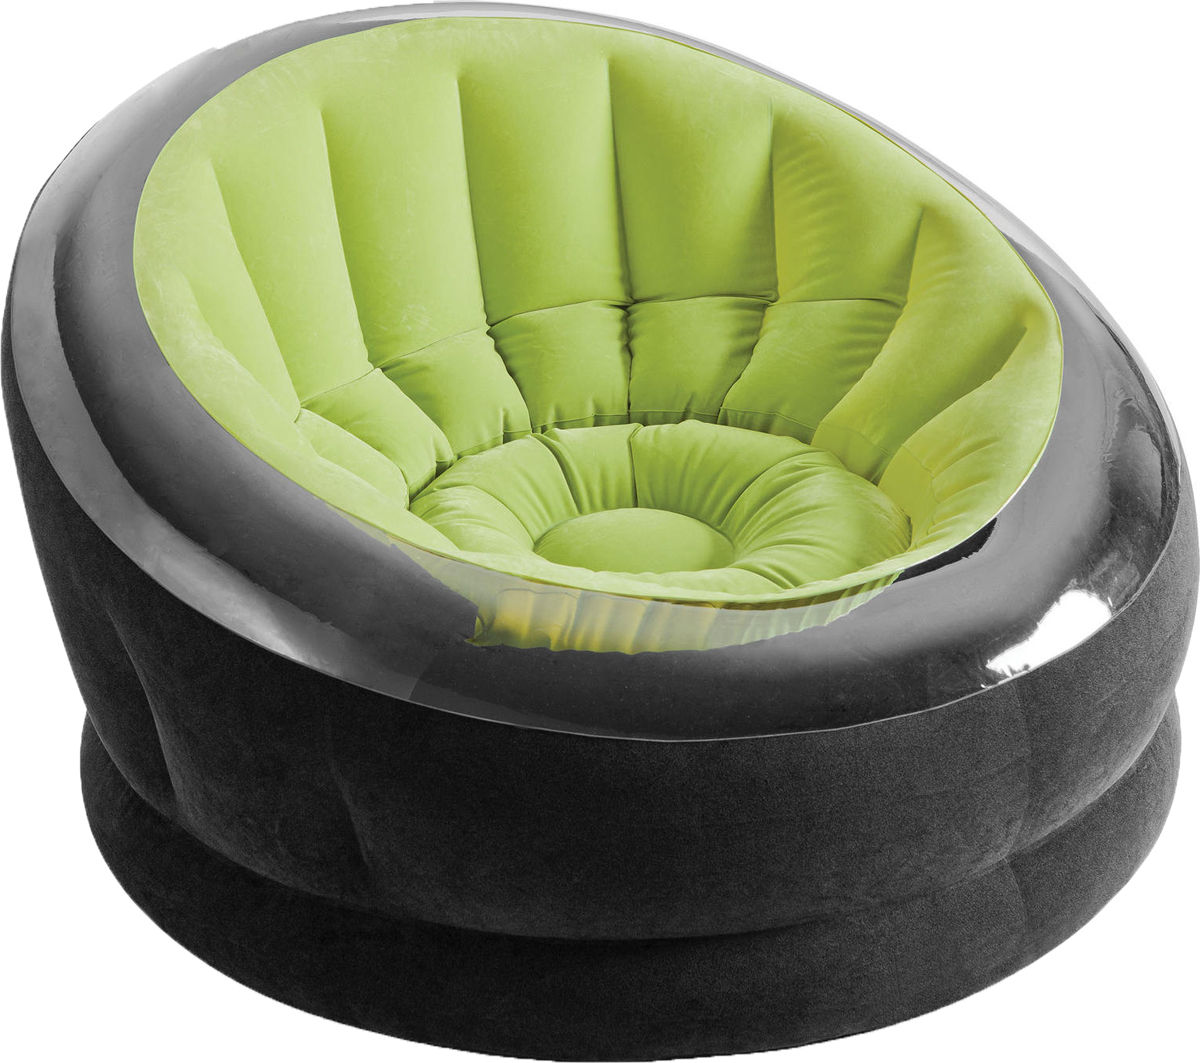 Кресло надувное Intex Empire Chair, 112 х 109 х 69 см надувное кресло onlitop fasigo 898271